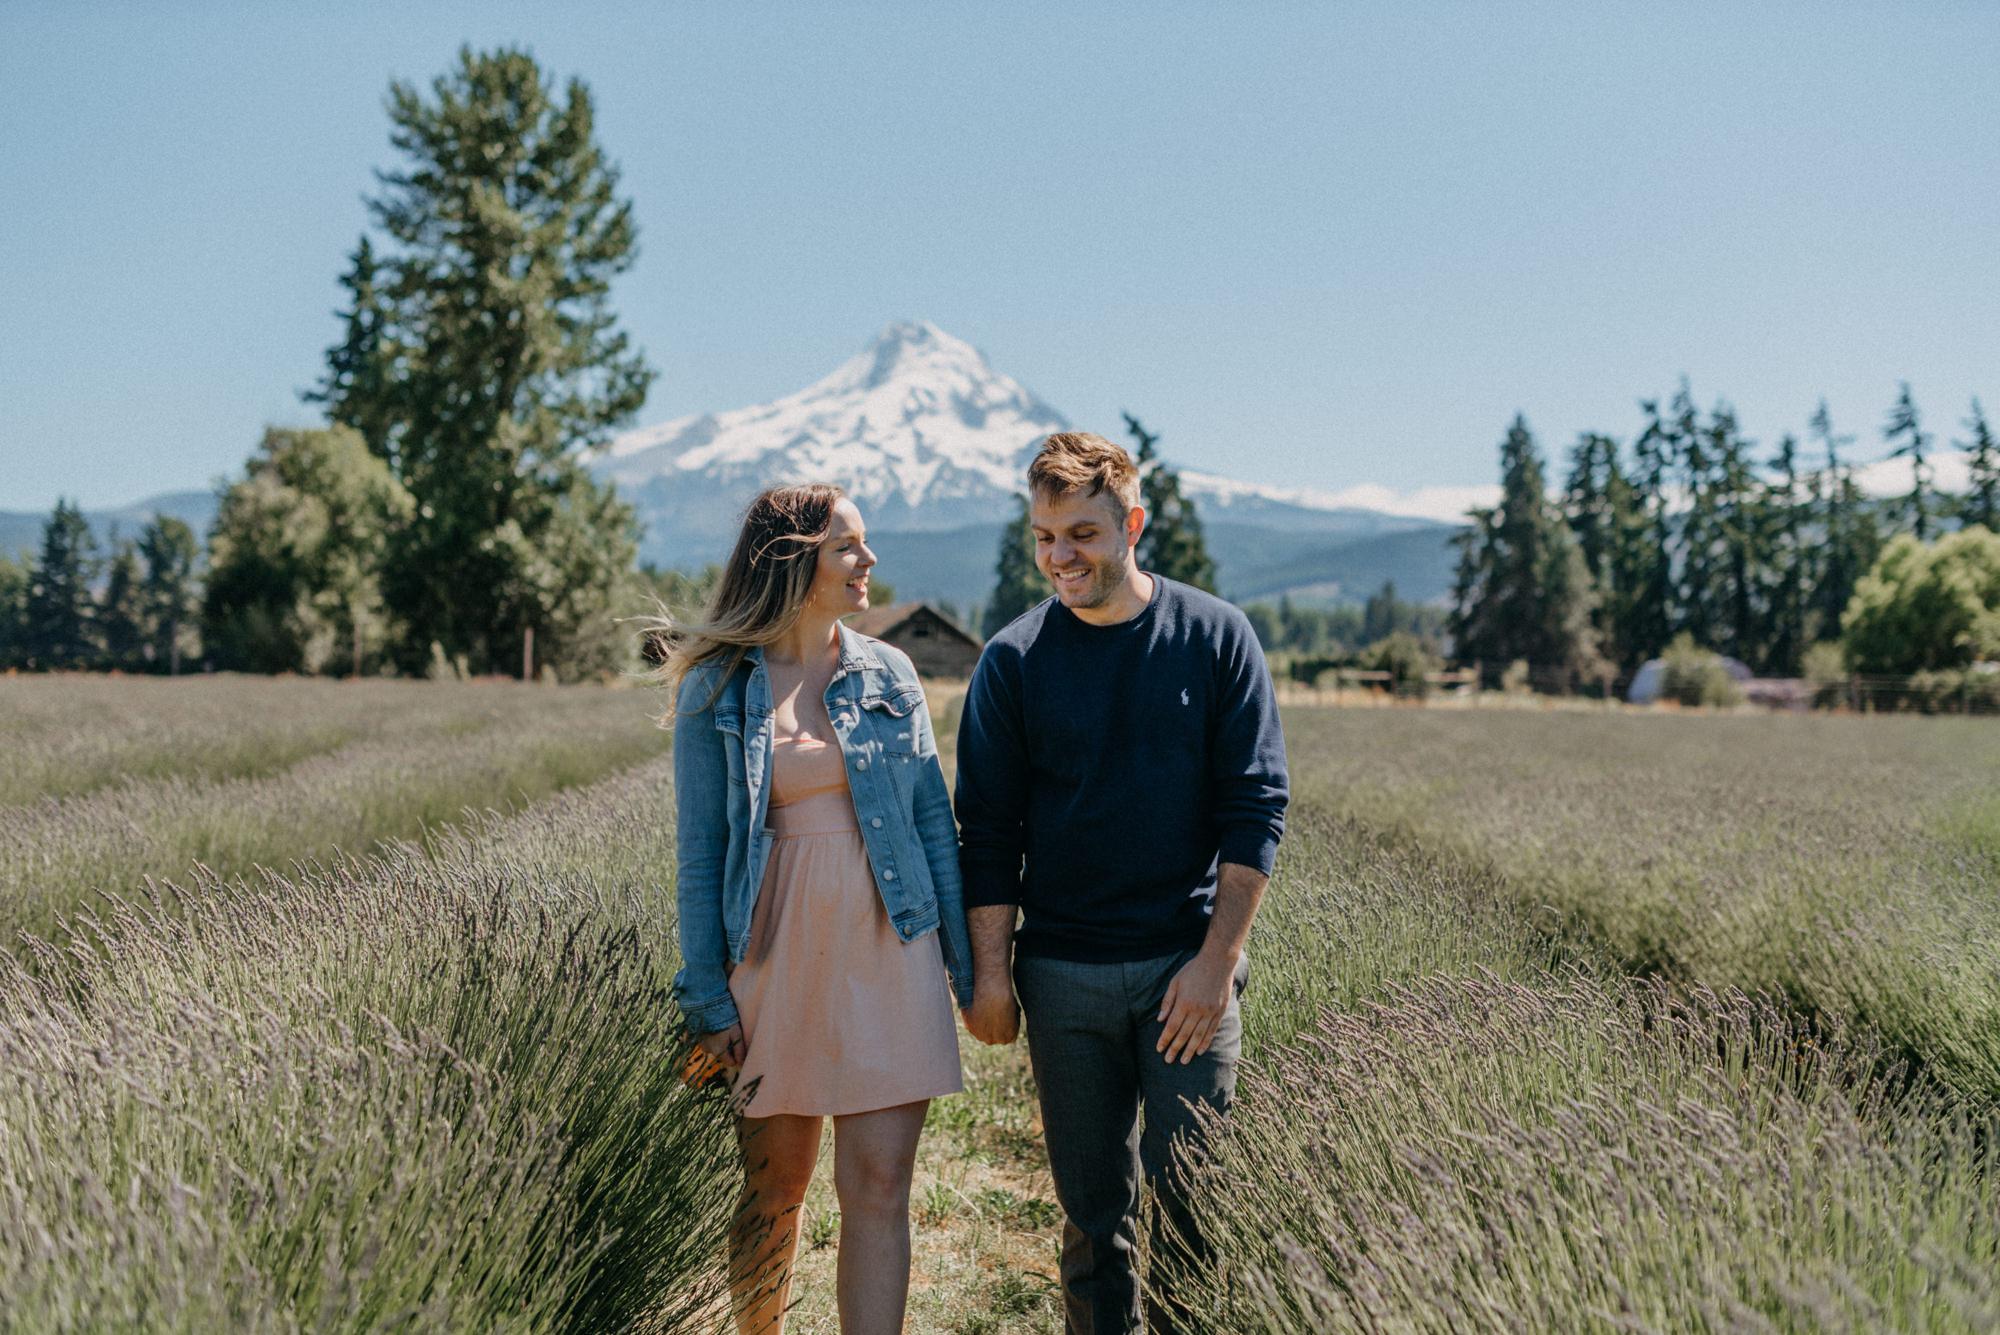 1-Mt-hood-lavender-farms-engagment-couple-summer-6926.jpg